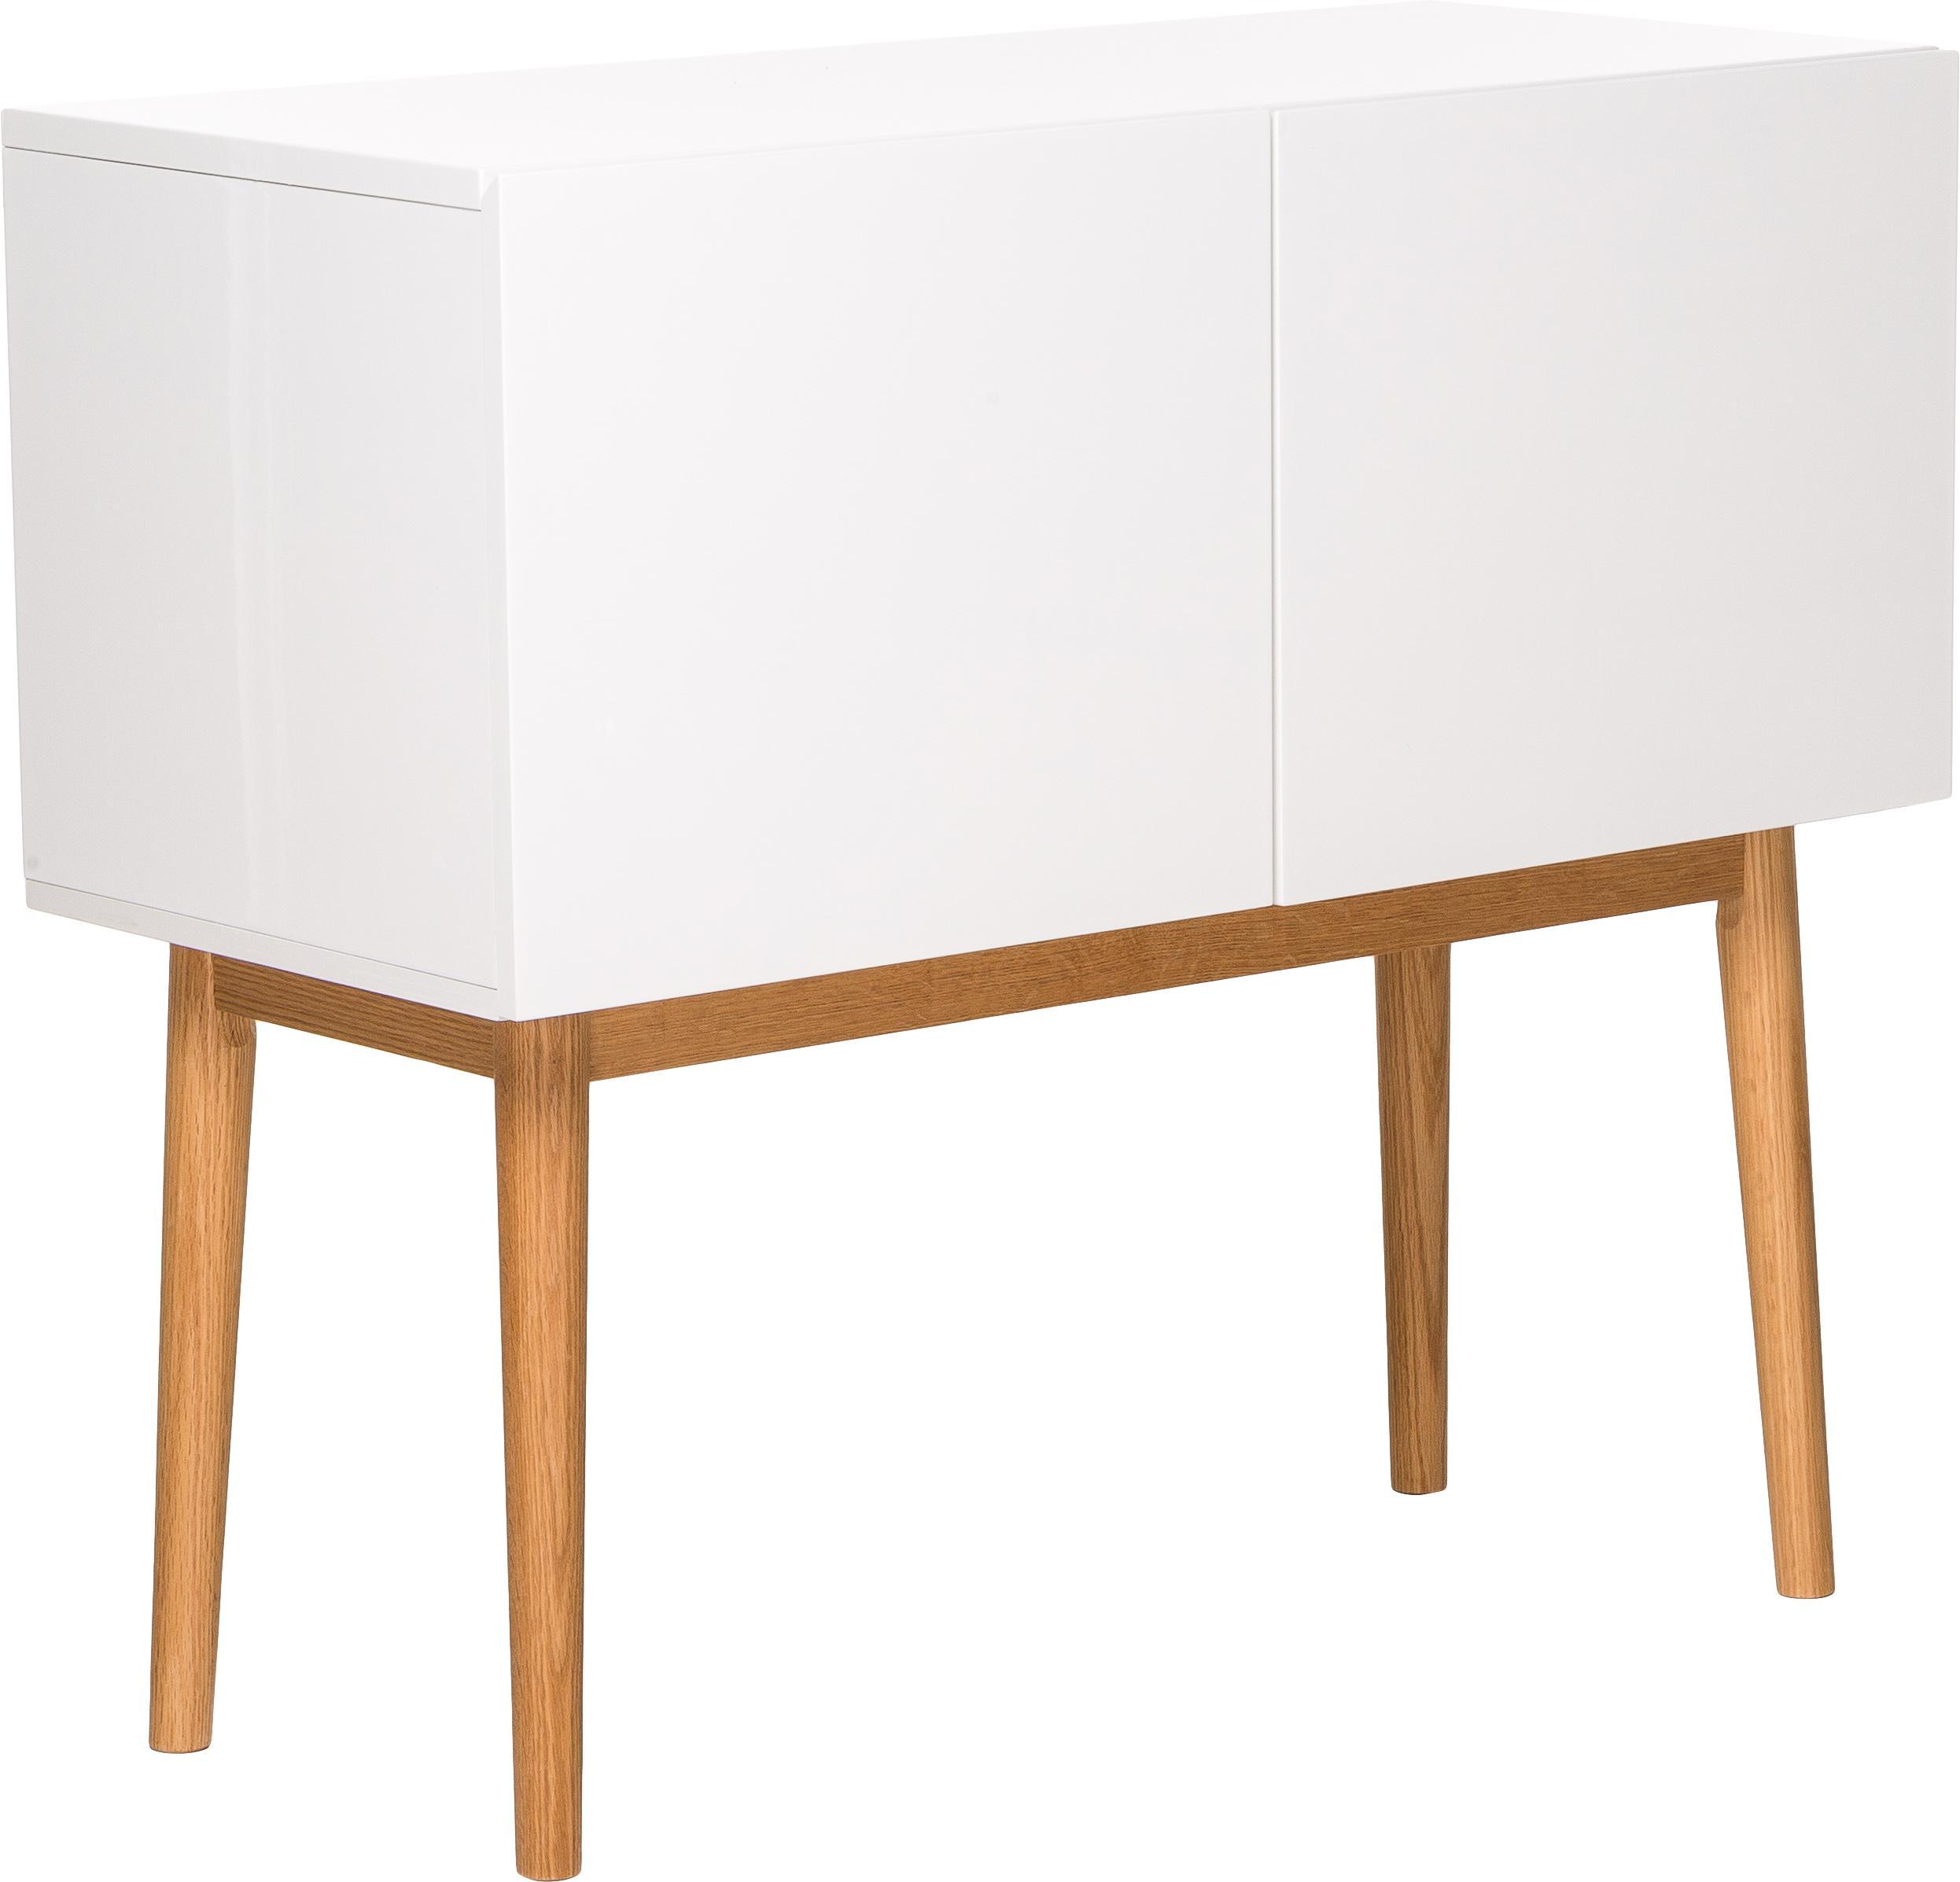 Cómoda pequeña High on Wood, Estructura: tablero de fibras de dens, Patas: madera de roble maciza, Blanco, madera, An 90 x Al 80 cm